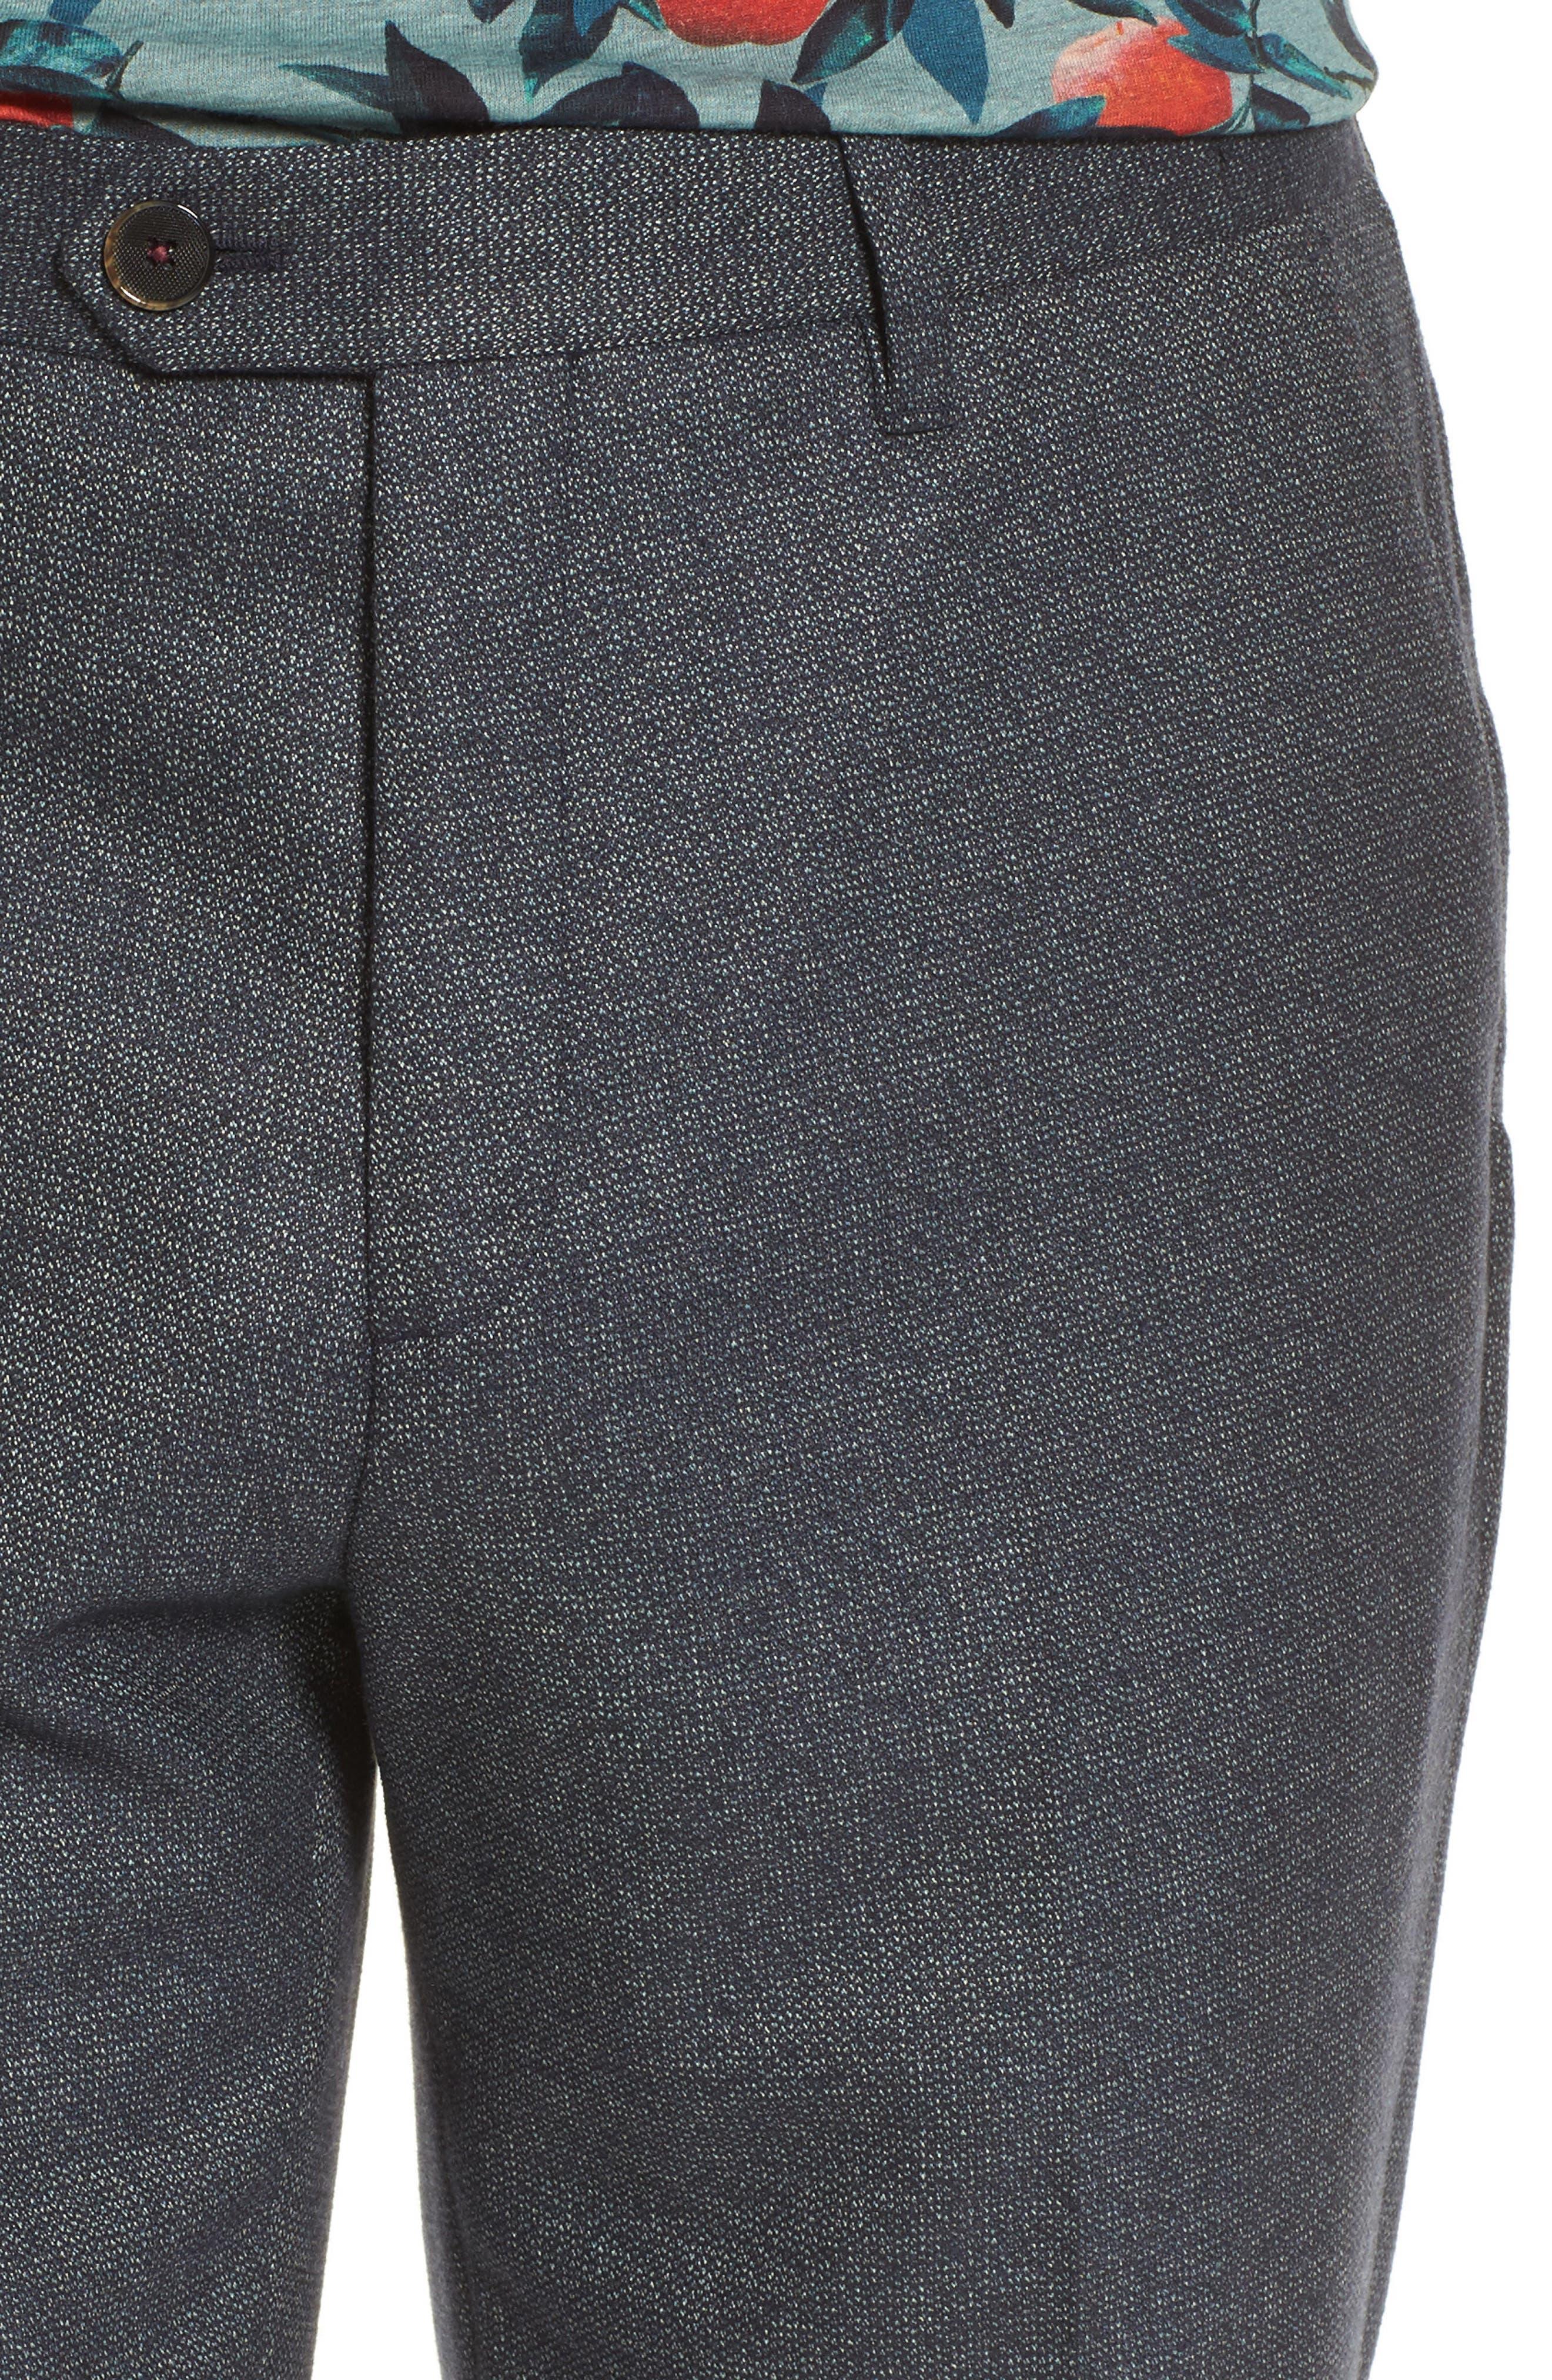 Beektro Trim Fit Trousers,                             Alternate thumbnail 4, color,